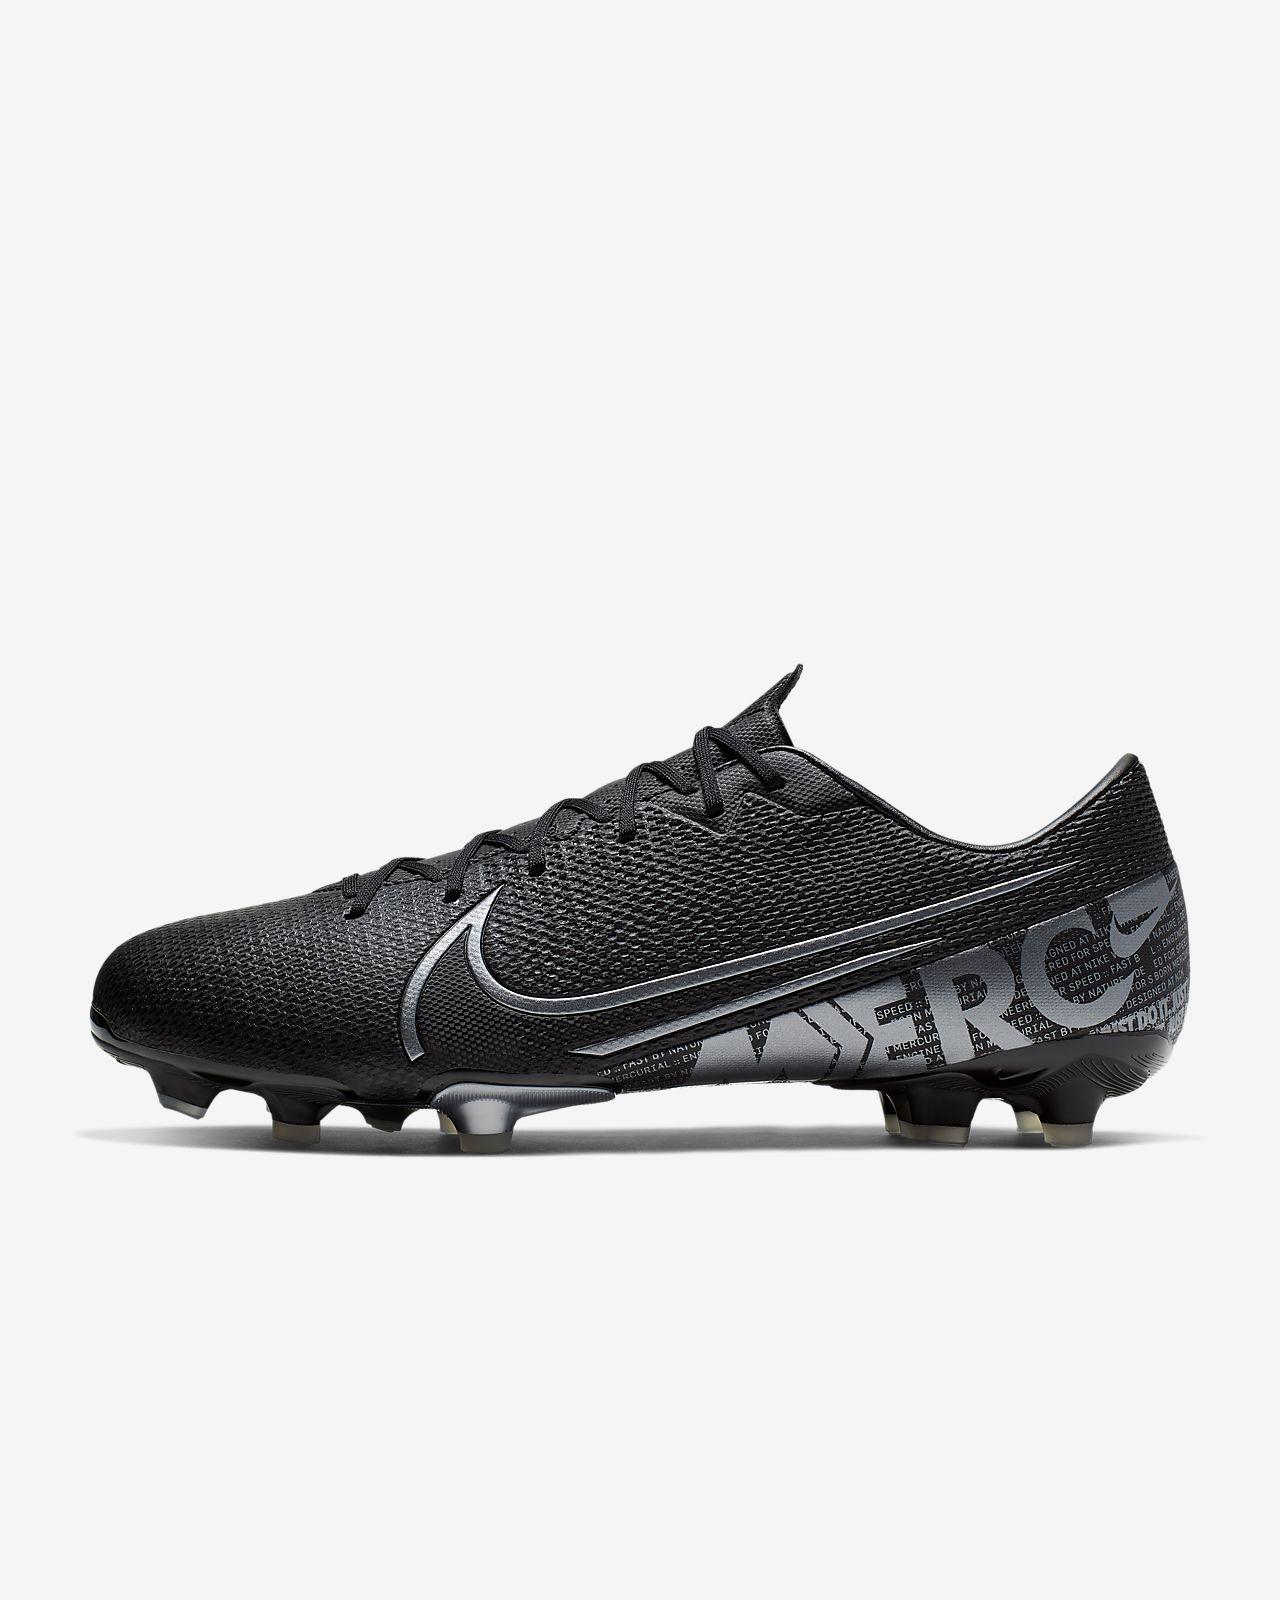 Calzado de fútbol para múltiples superficies Nike Mercurial Vapor 13 Academy MG